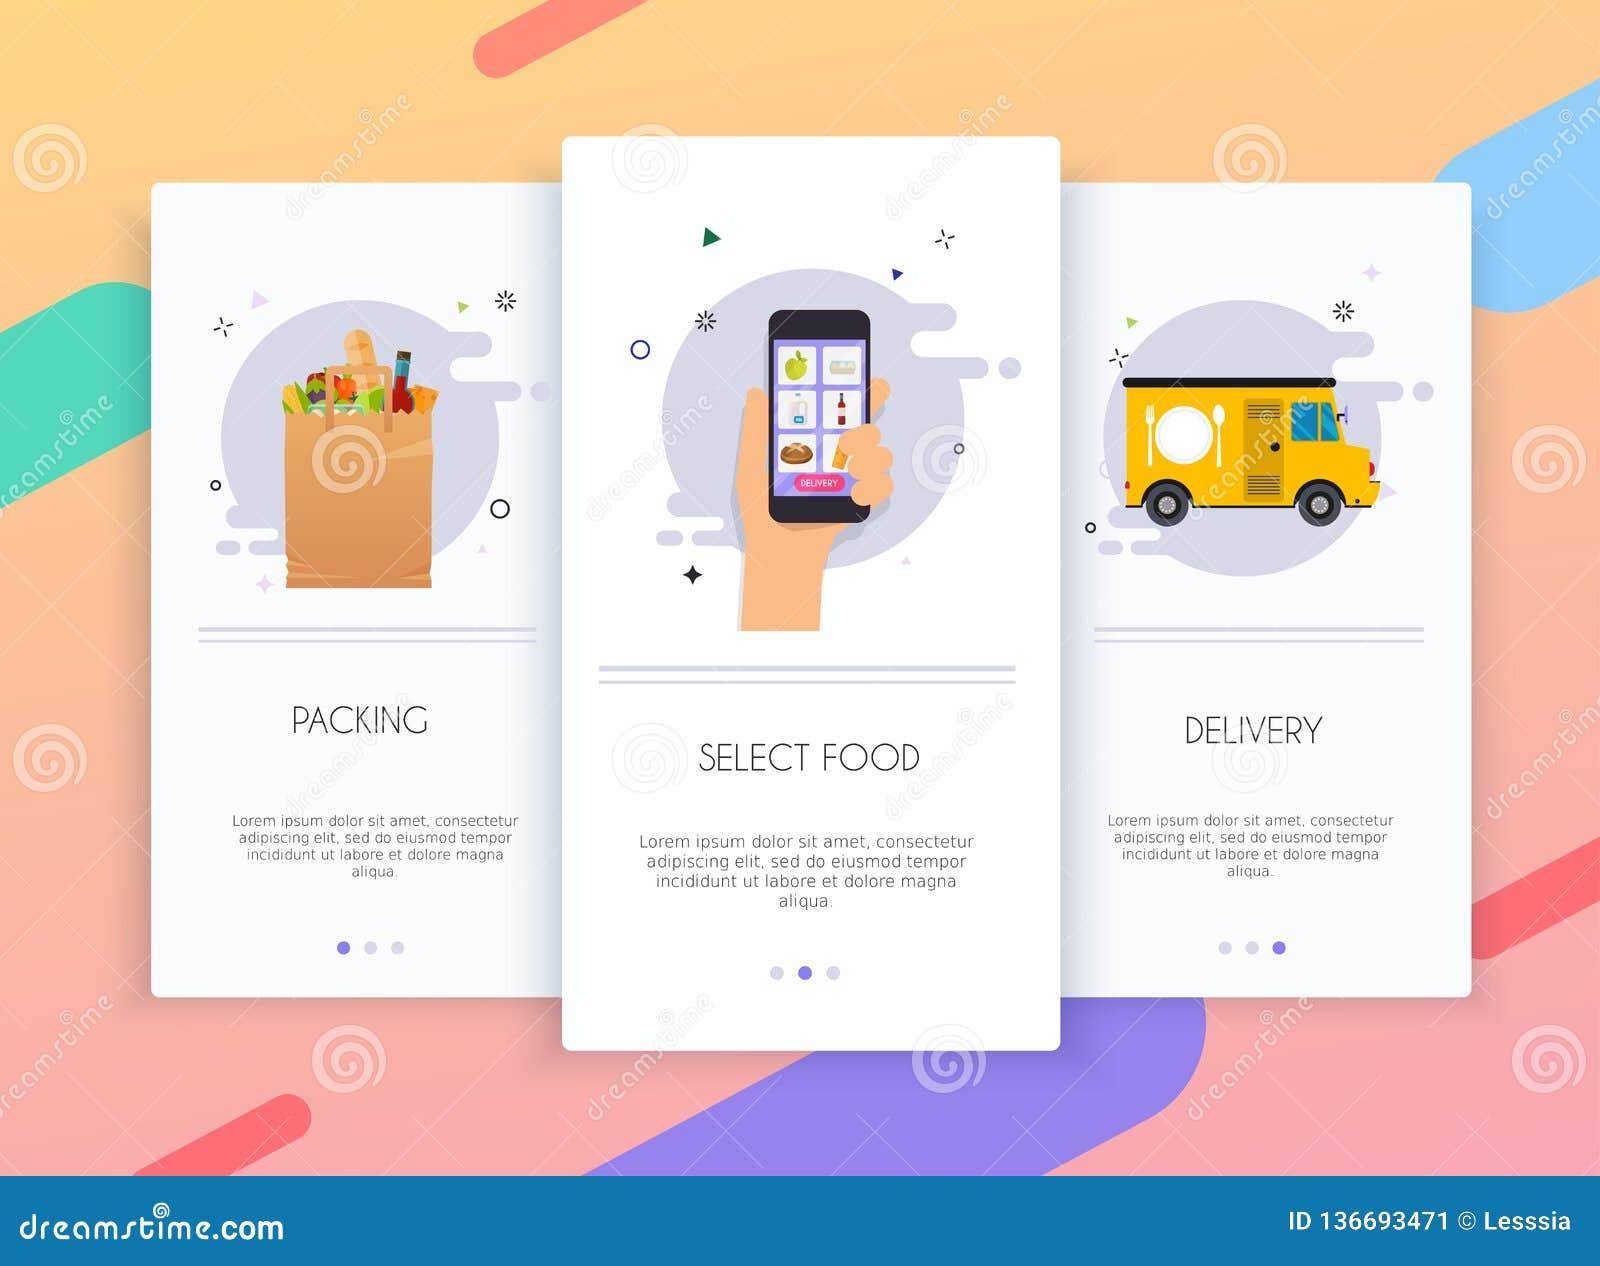 Onboarding Screens User Interface Kit For Mobile App